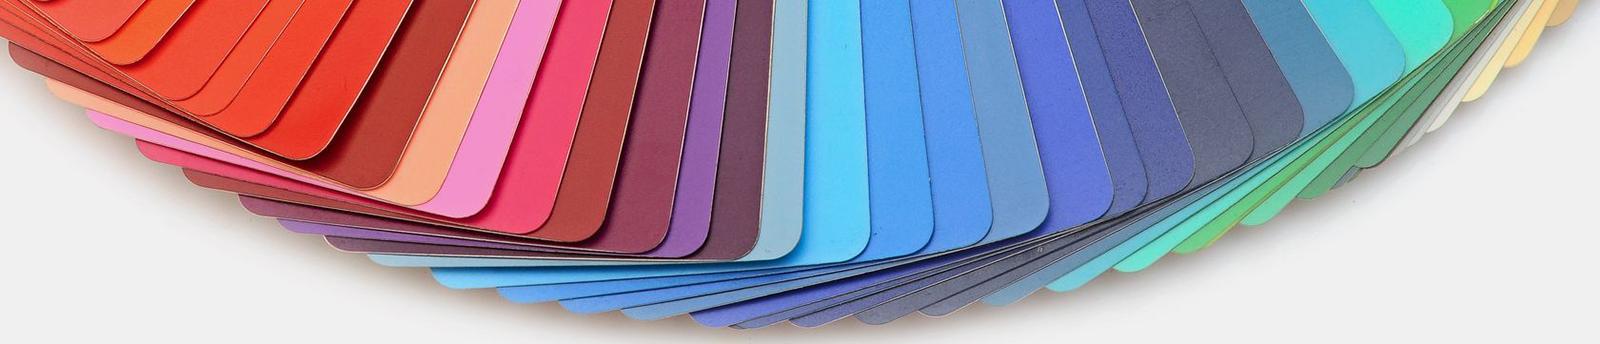 kleuranalyse